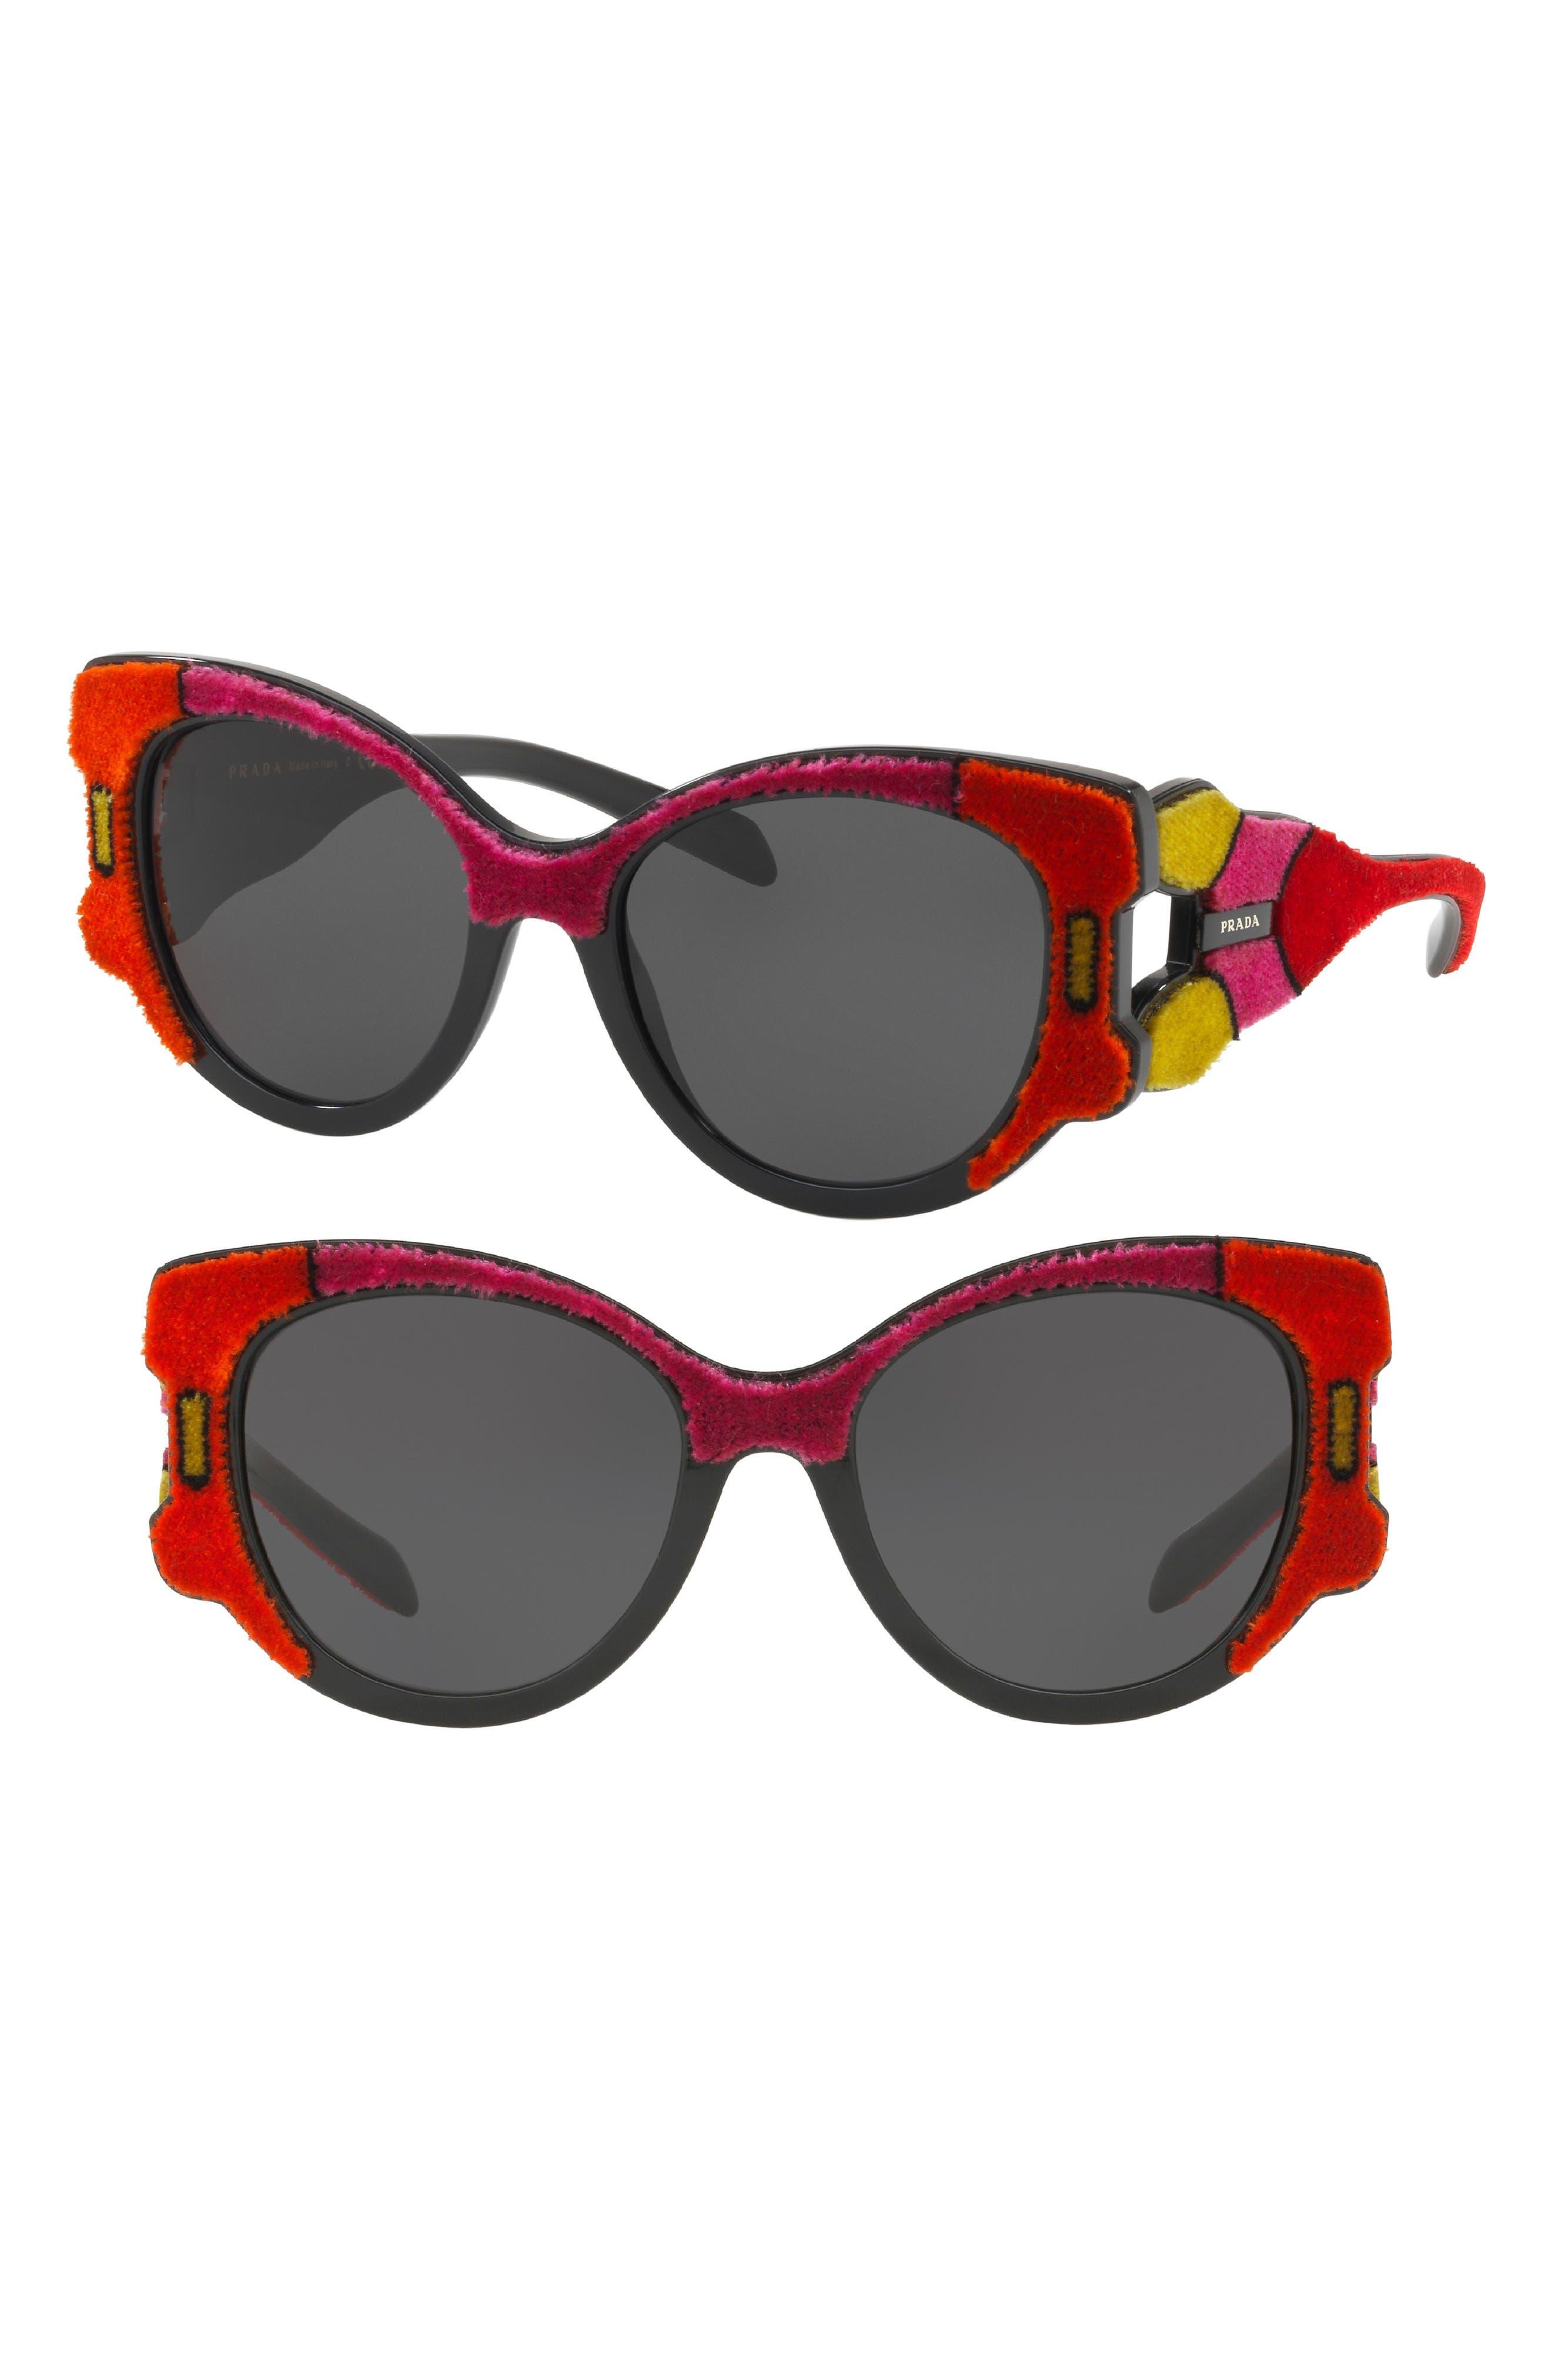 Alternate Image 1 Selected - Prada 54mm Colorblock Round Sunglasses